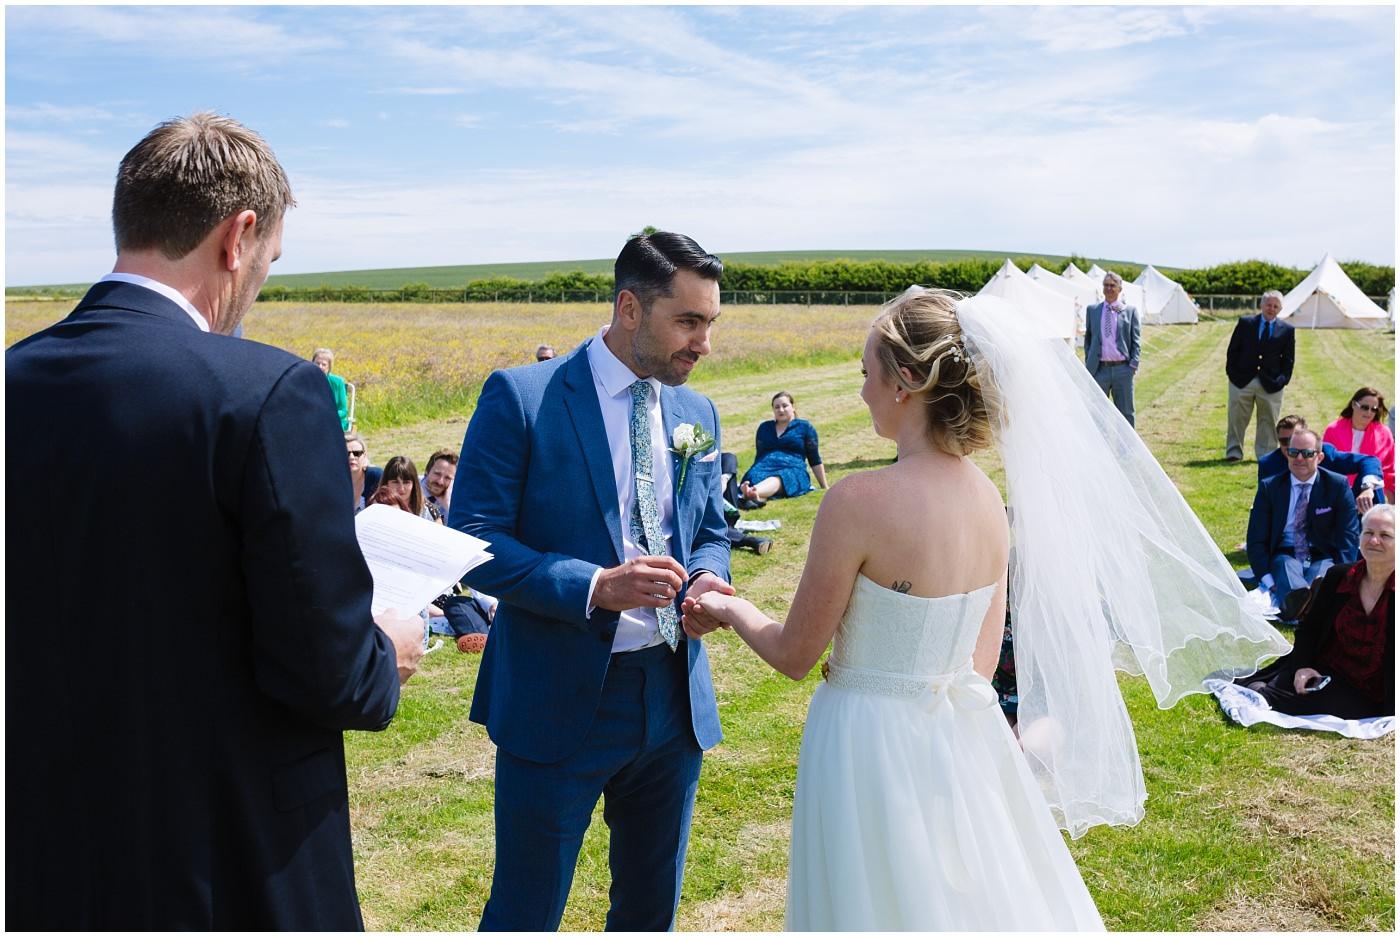 bride and groom exchange rings at wildwood and eden wedding outdoor ceremony